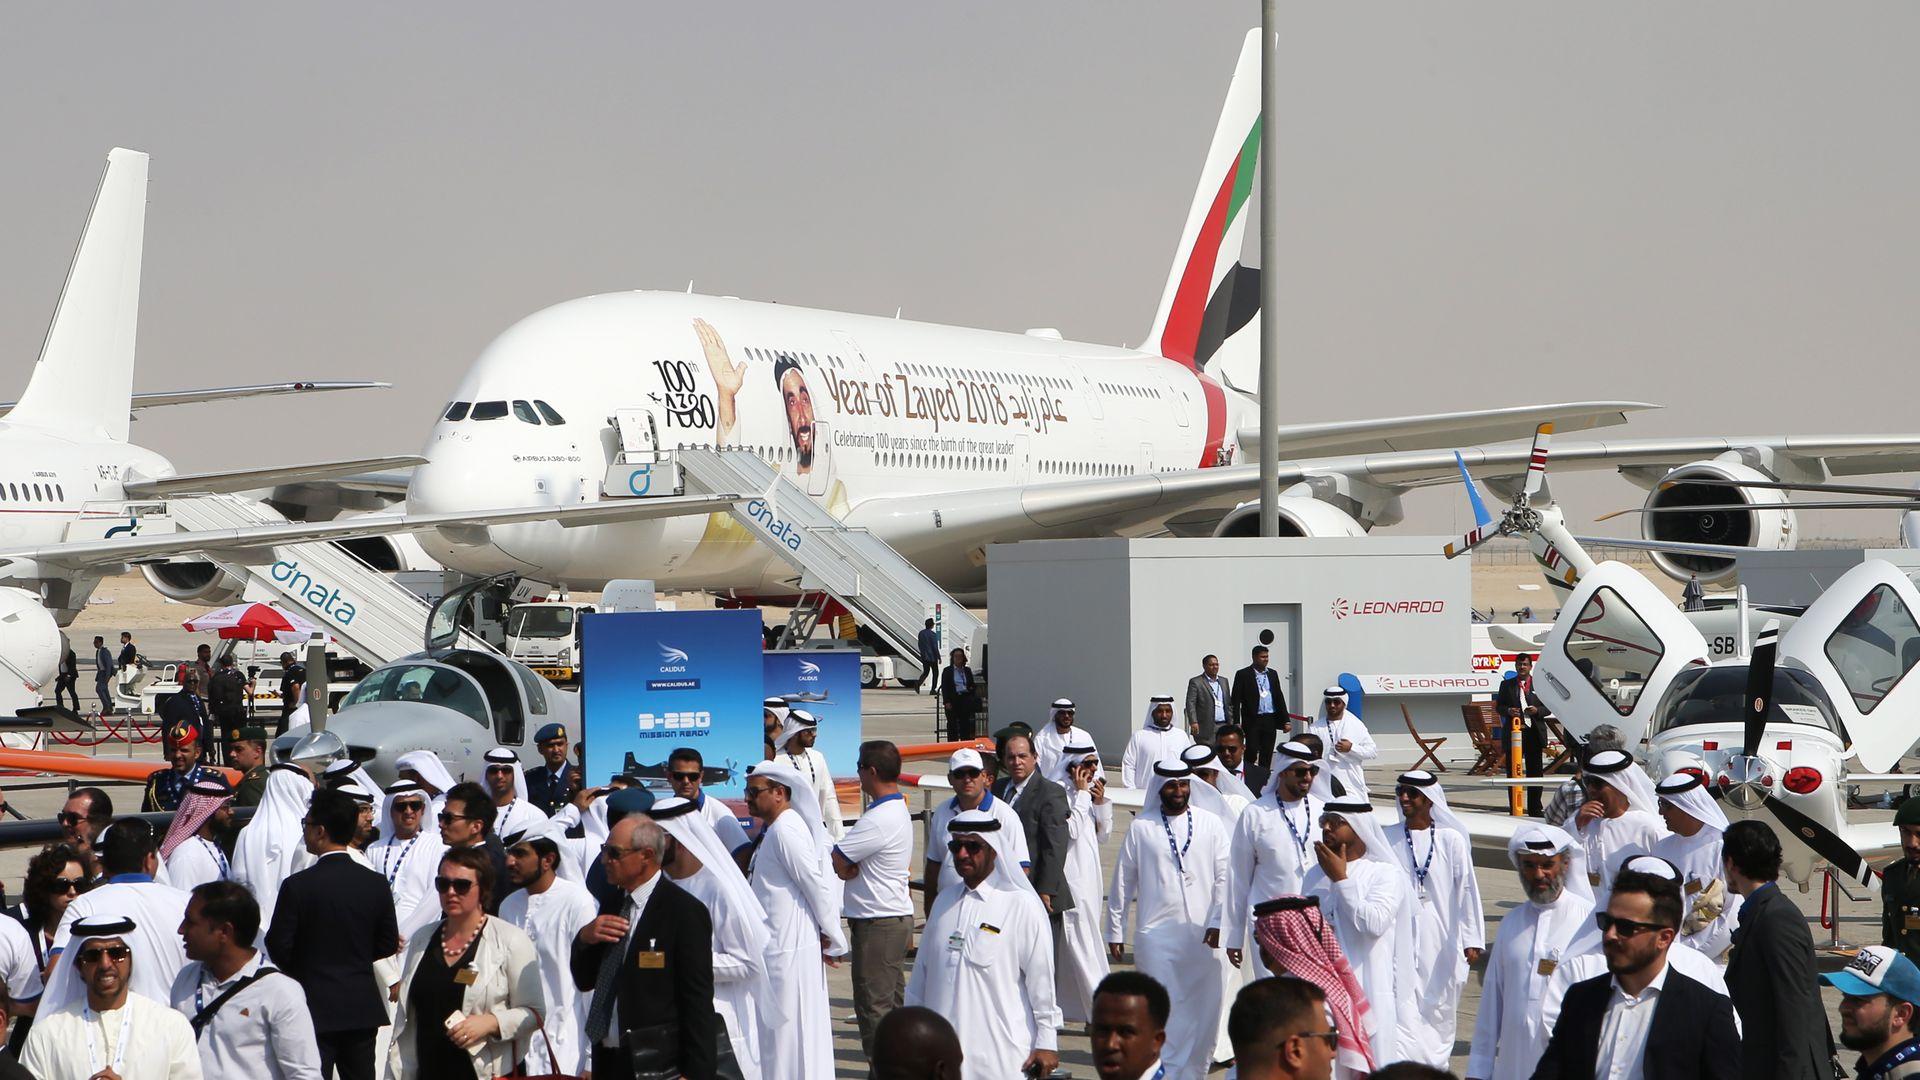 A plane on crowded tarmac